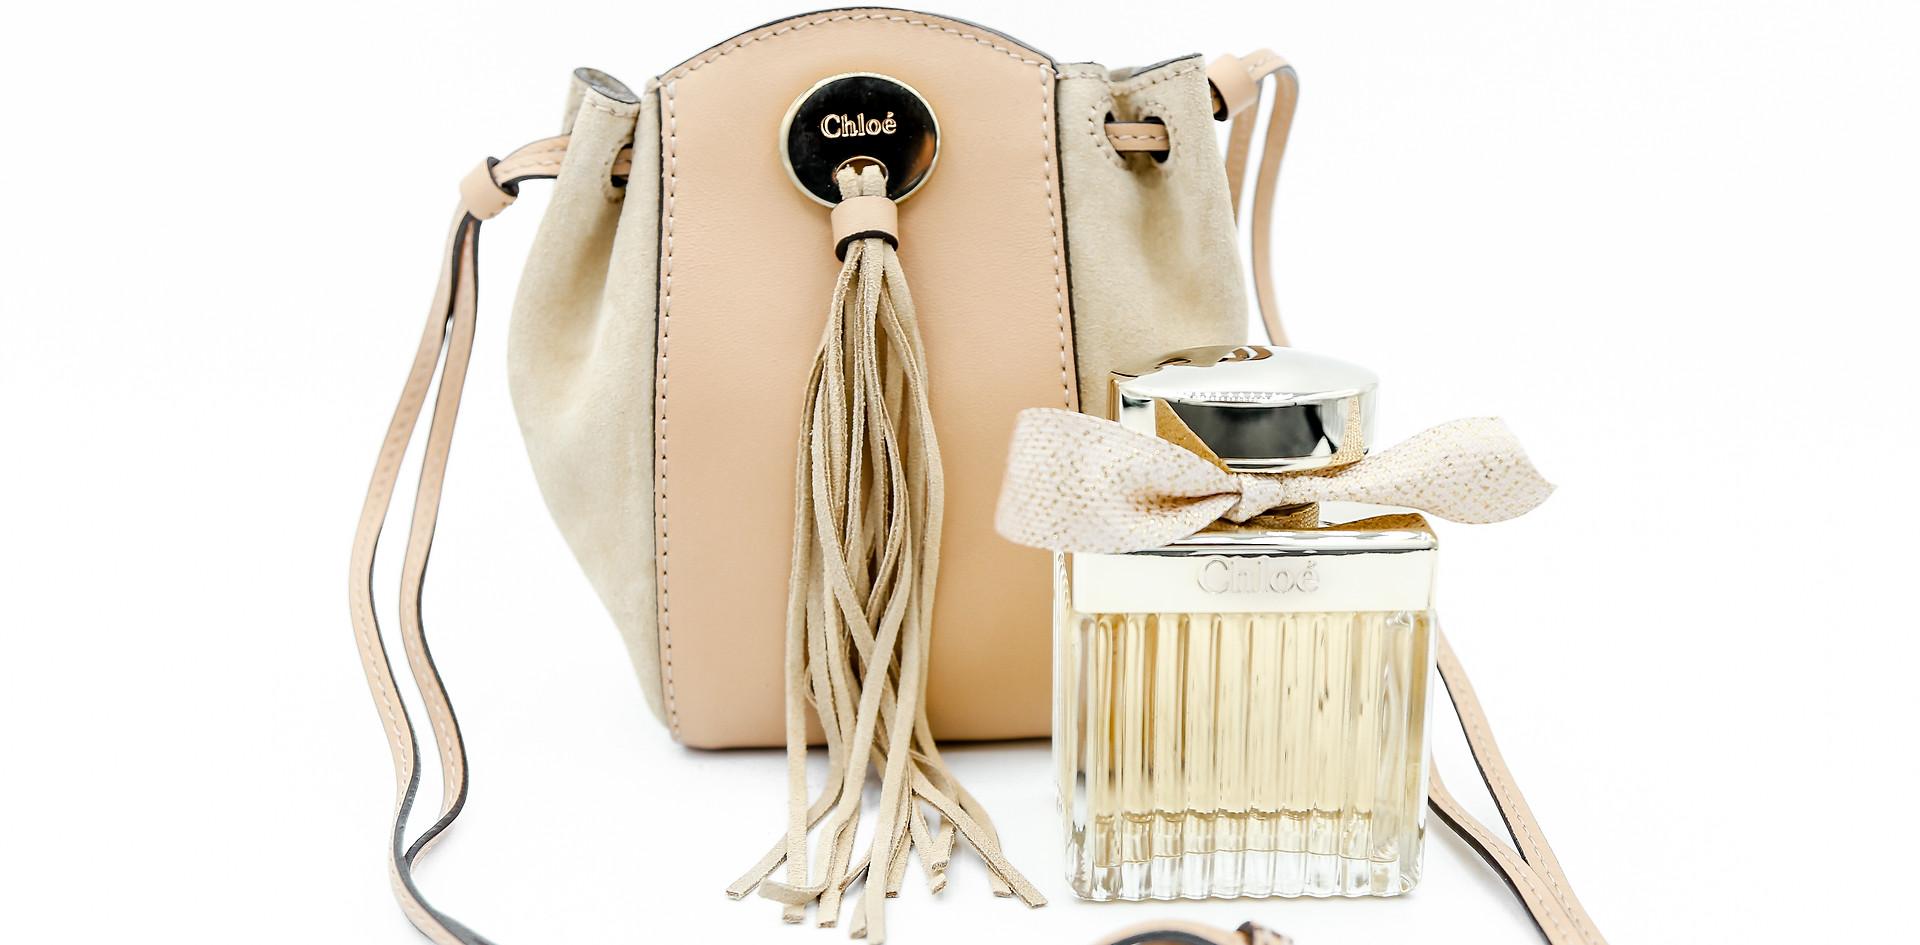 Chloe handbag + fragrance